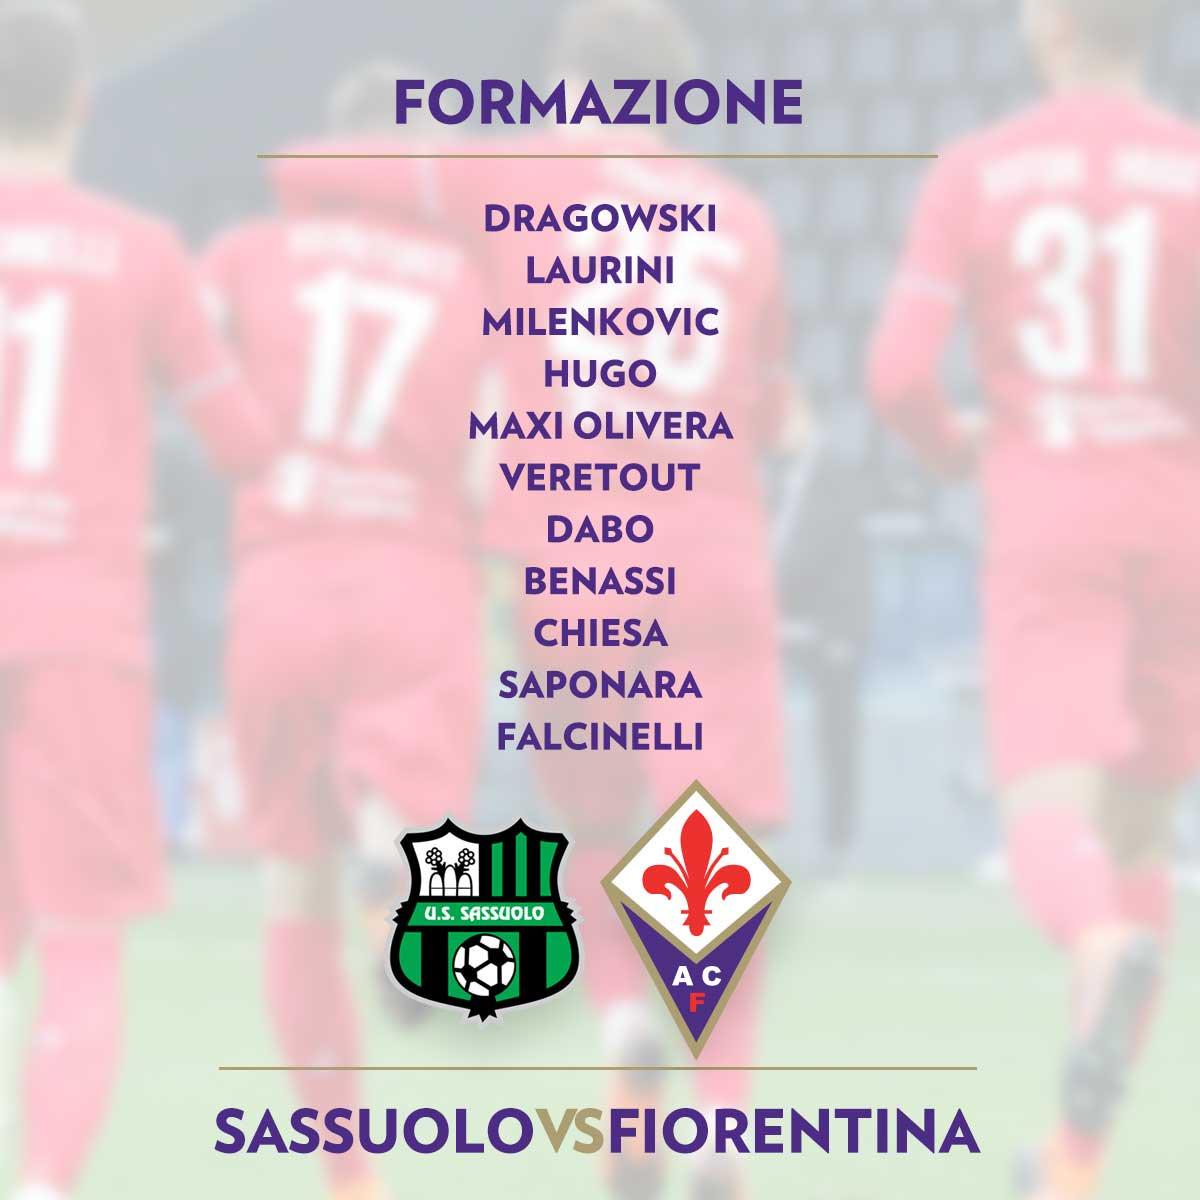 #SassuoloFiorentina